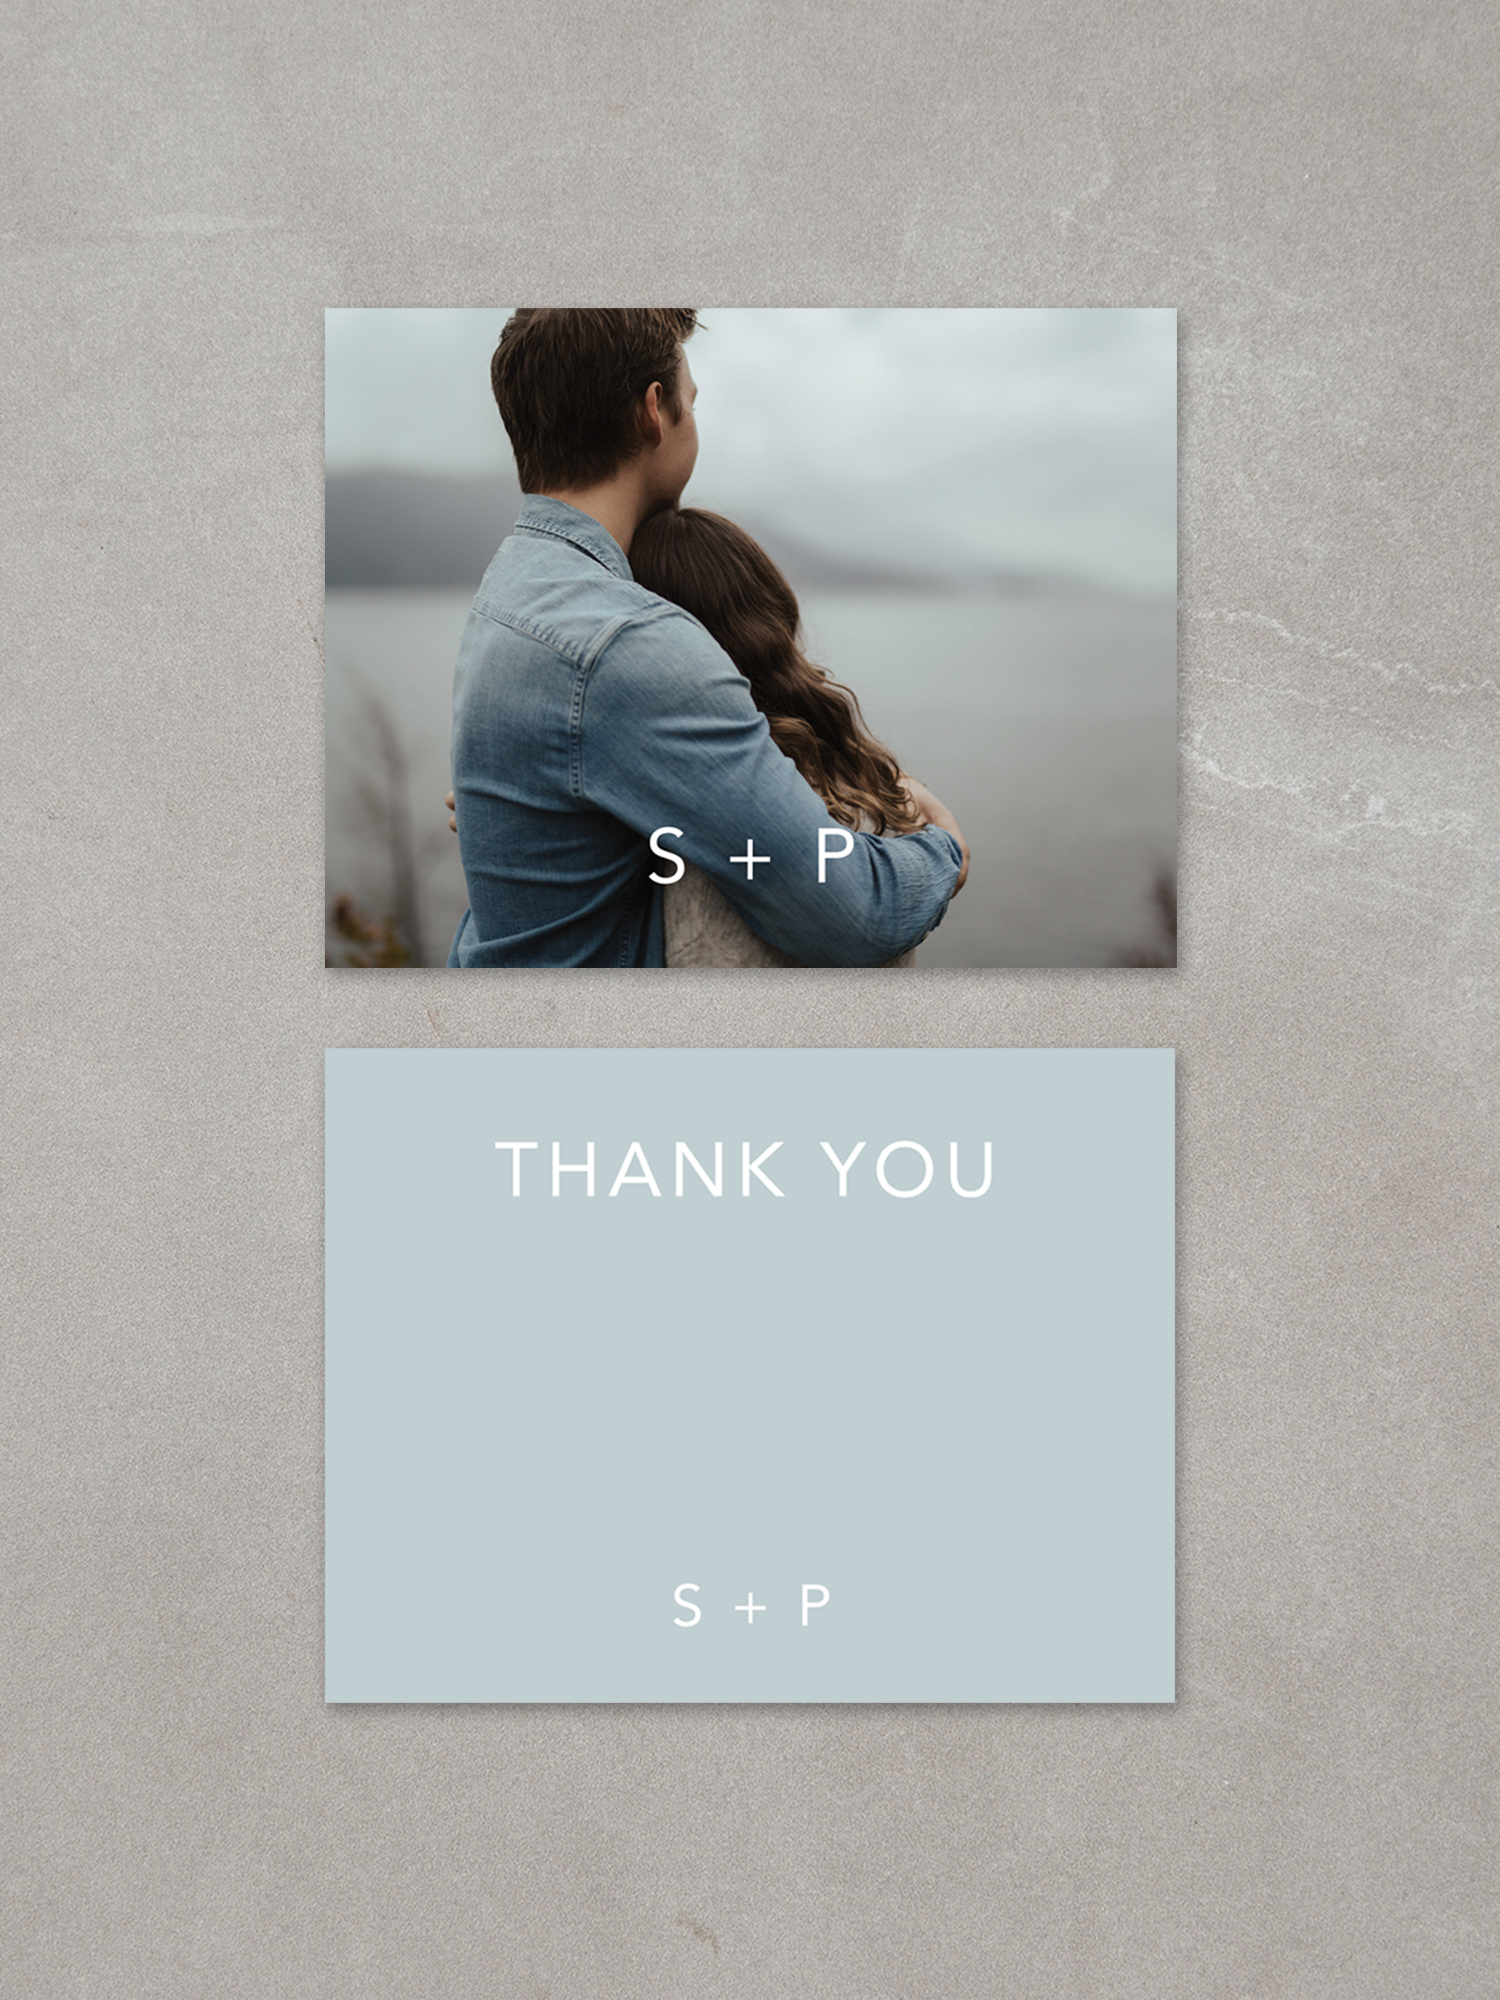 Forelsket // Thank You Card in fog ink background